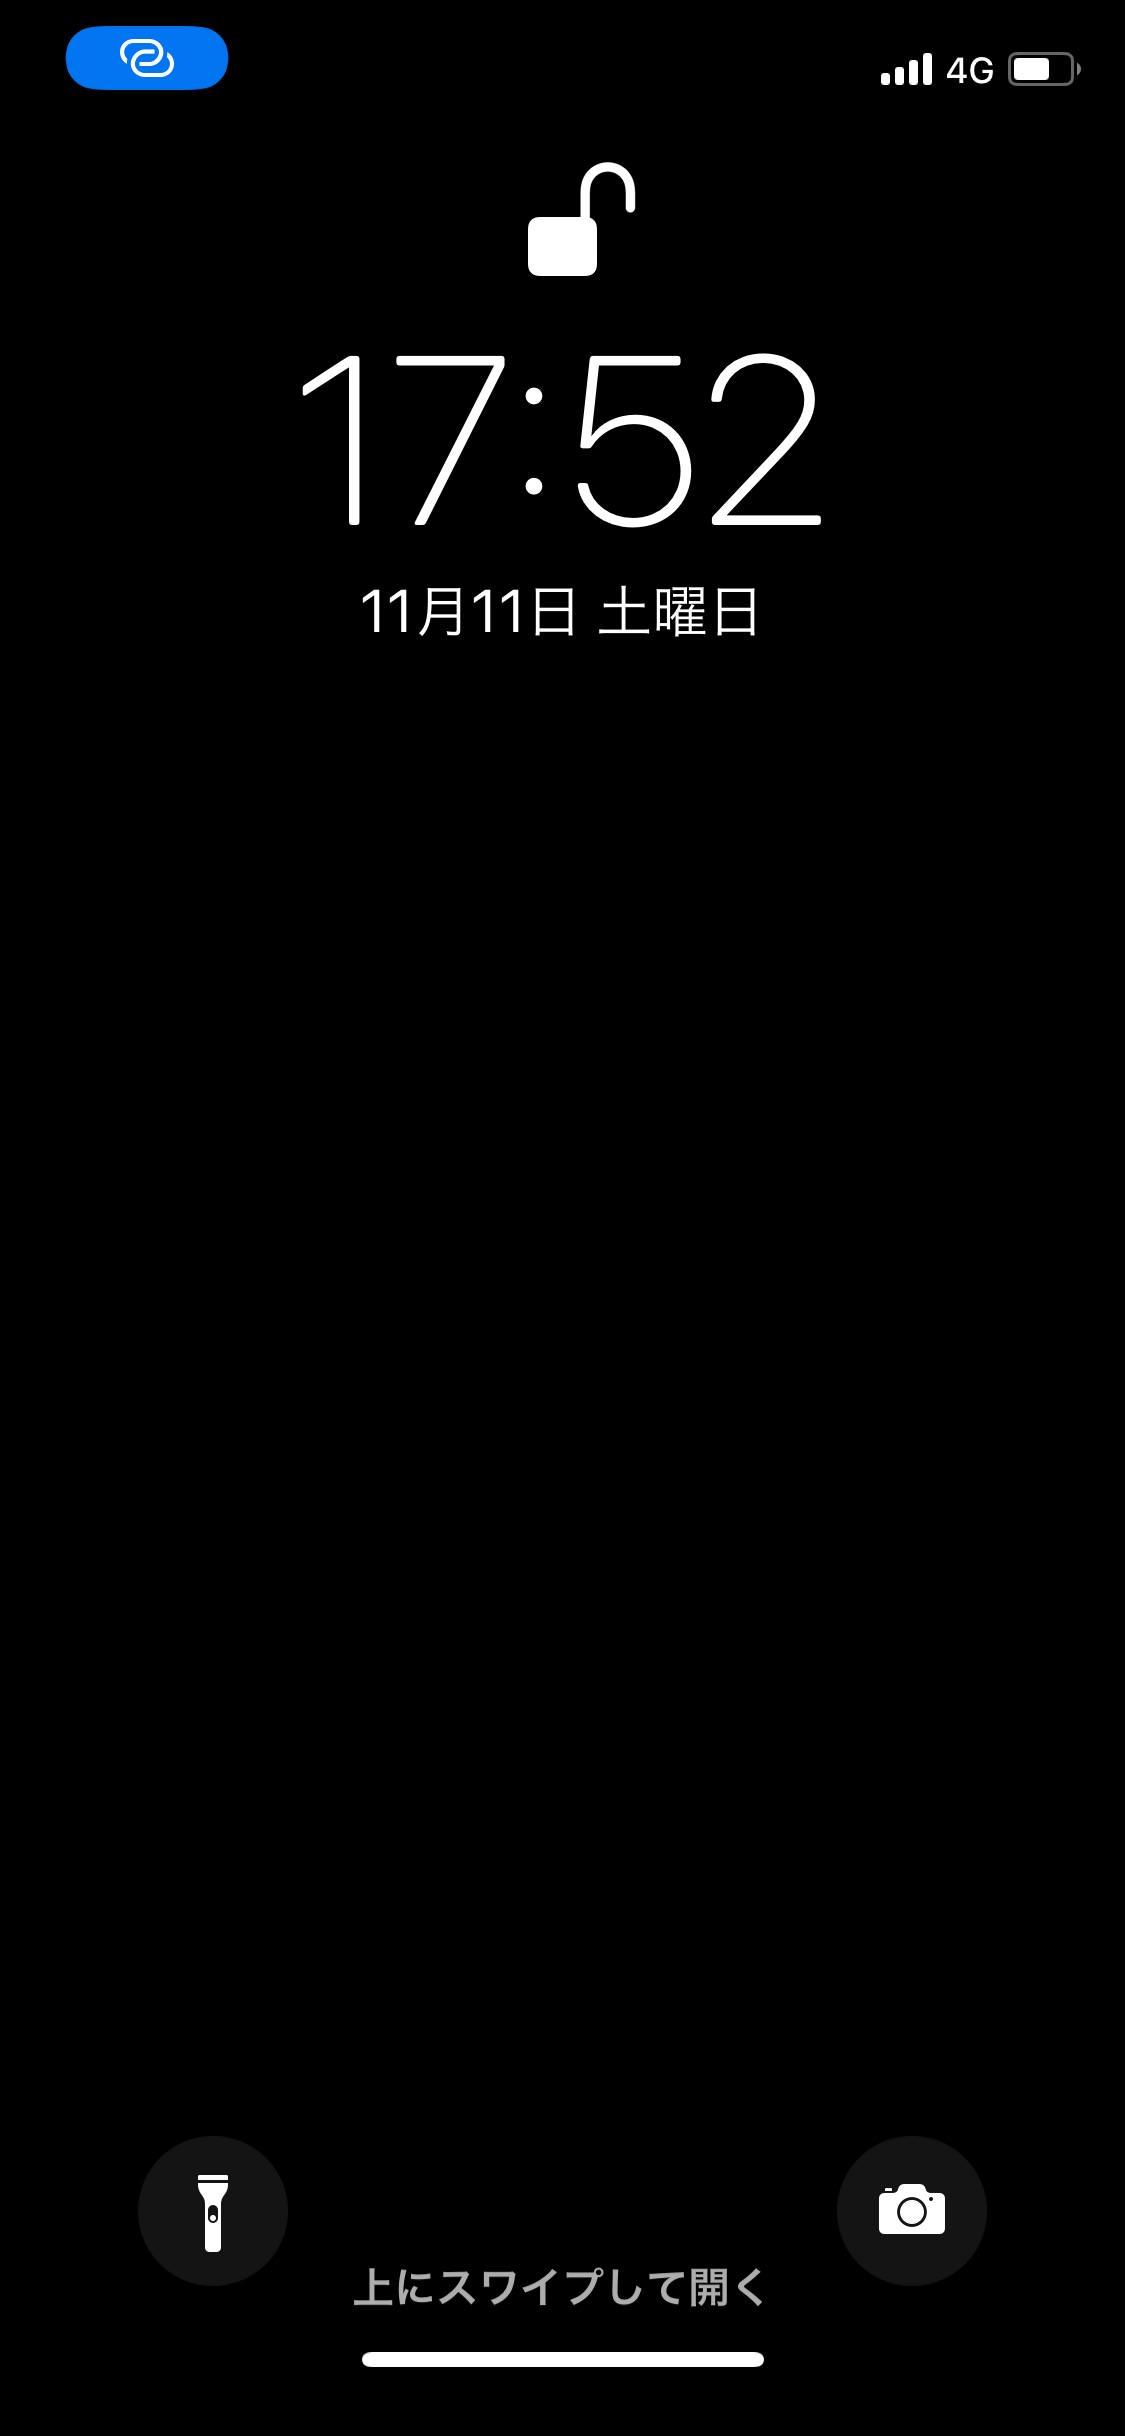 Iphone X のバッテリー消費を大幅に減少させる方法 黒壁紙や反転 スマート 機能で画面をできるだけ黒に Corriente Top